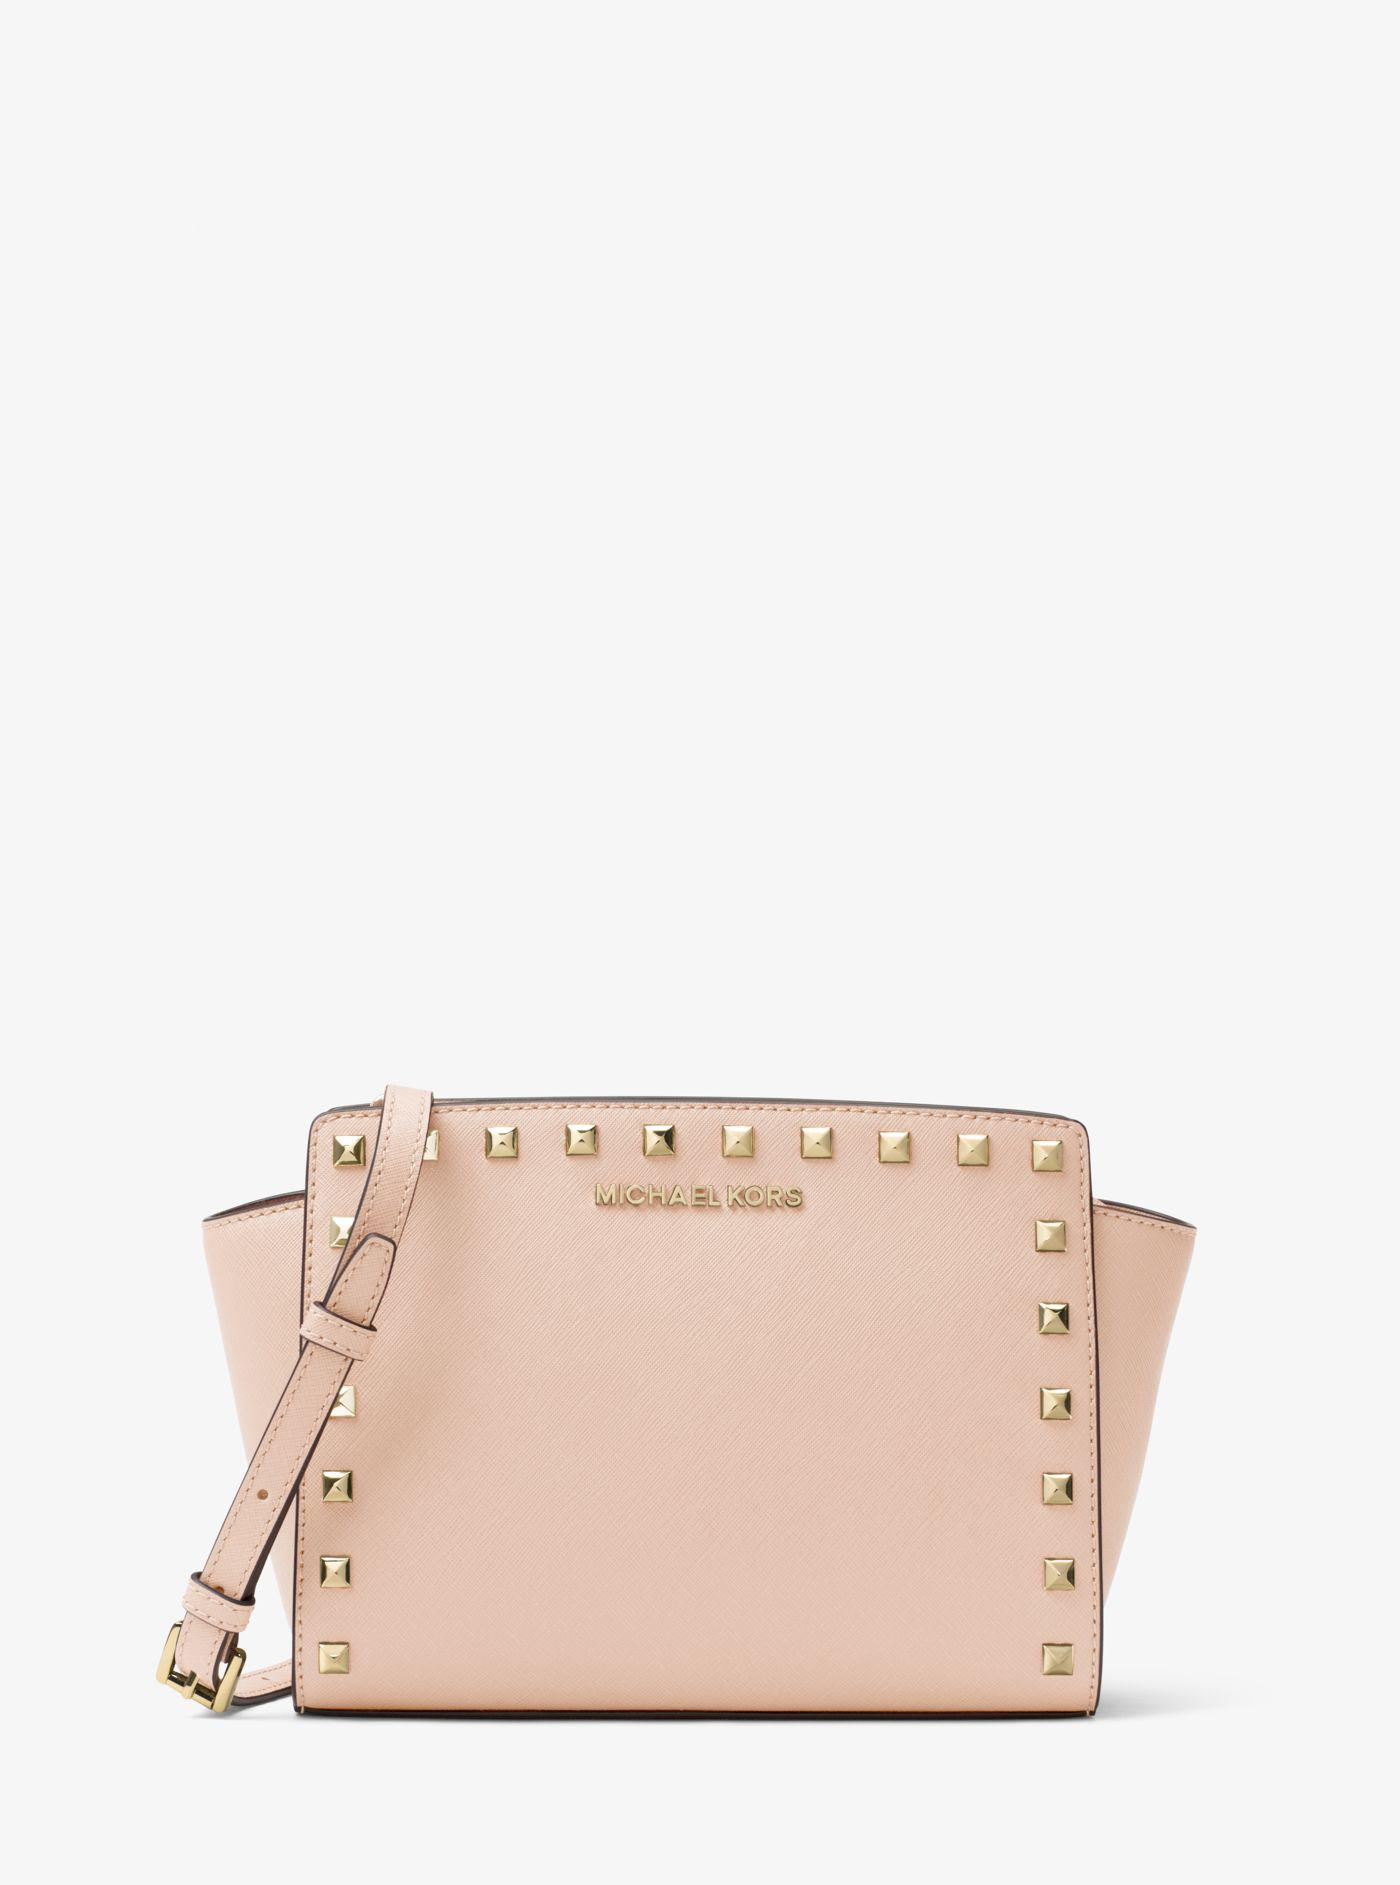 119c038e0050 Michael Kors Selma Medium Metallic Leather Crossbody in Pink - Lyst